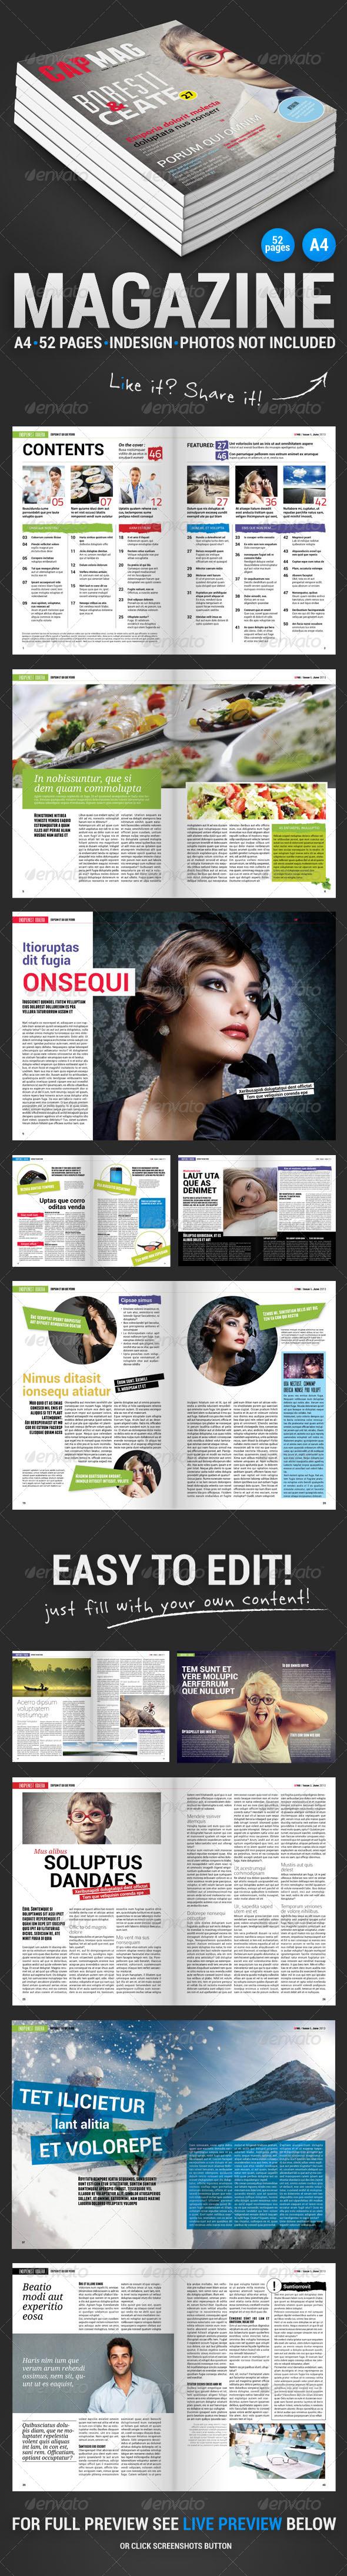 CapMag 52 Pages Magazine - Magazines Print Templates